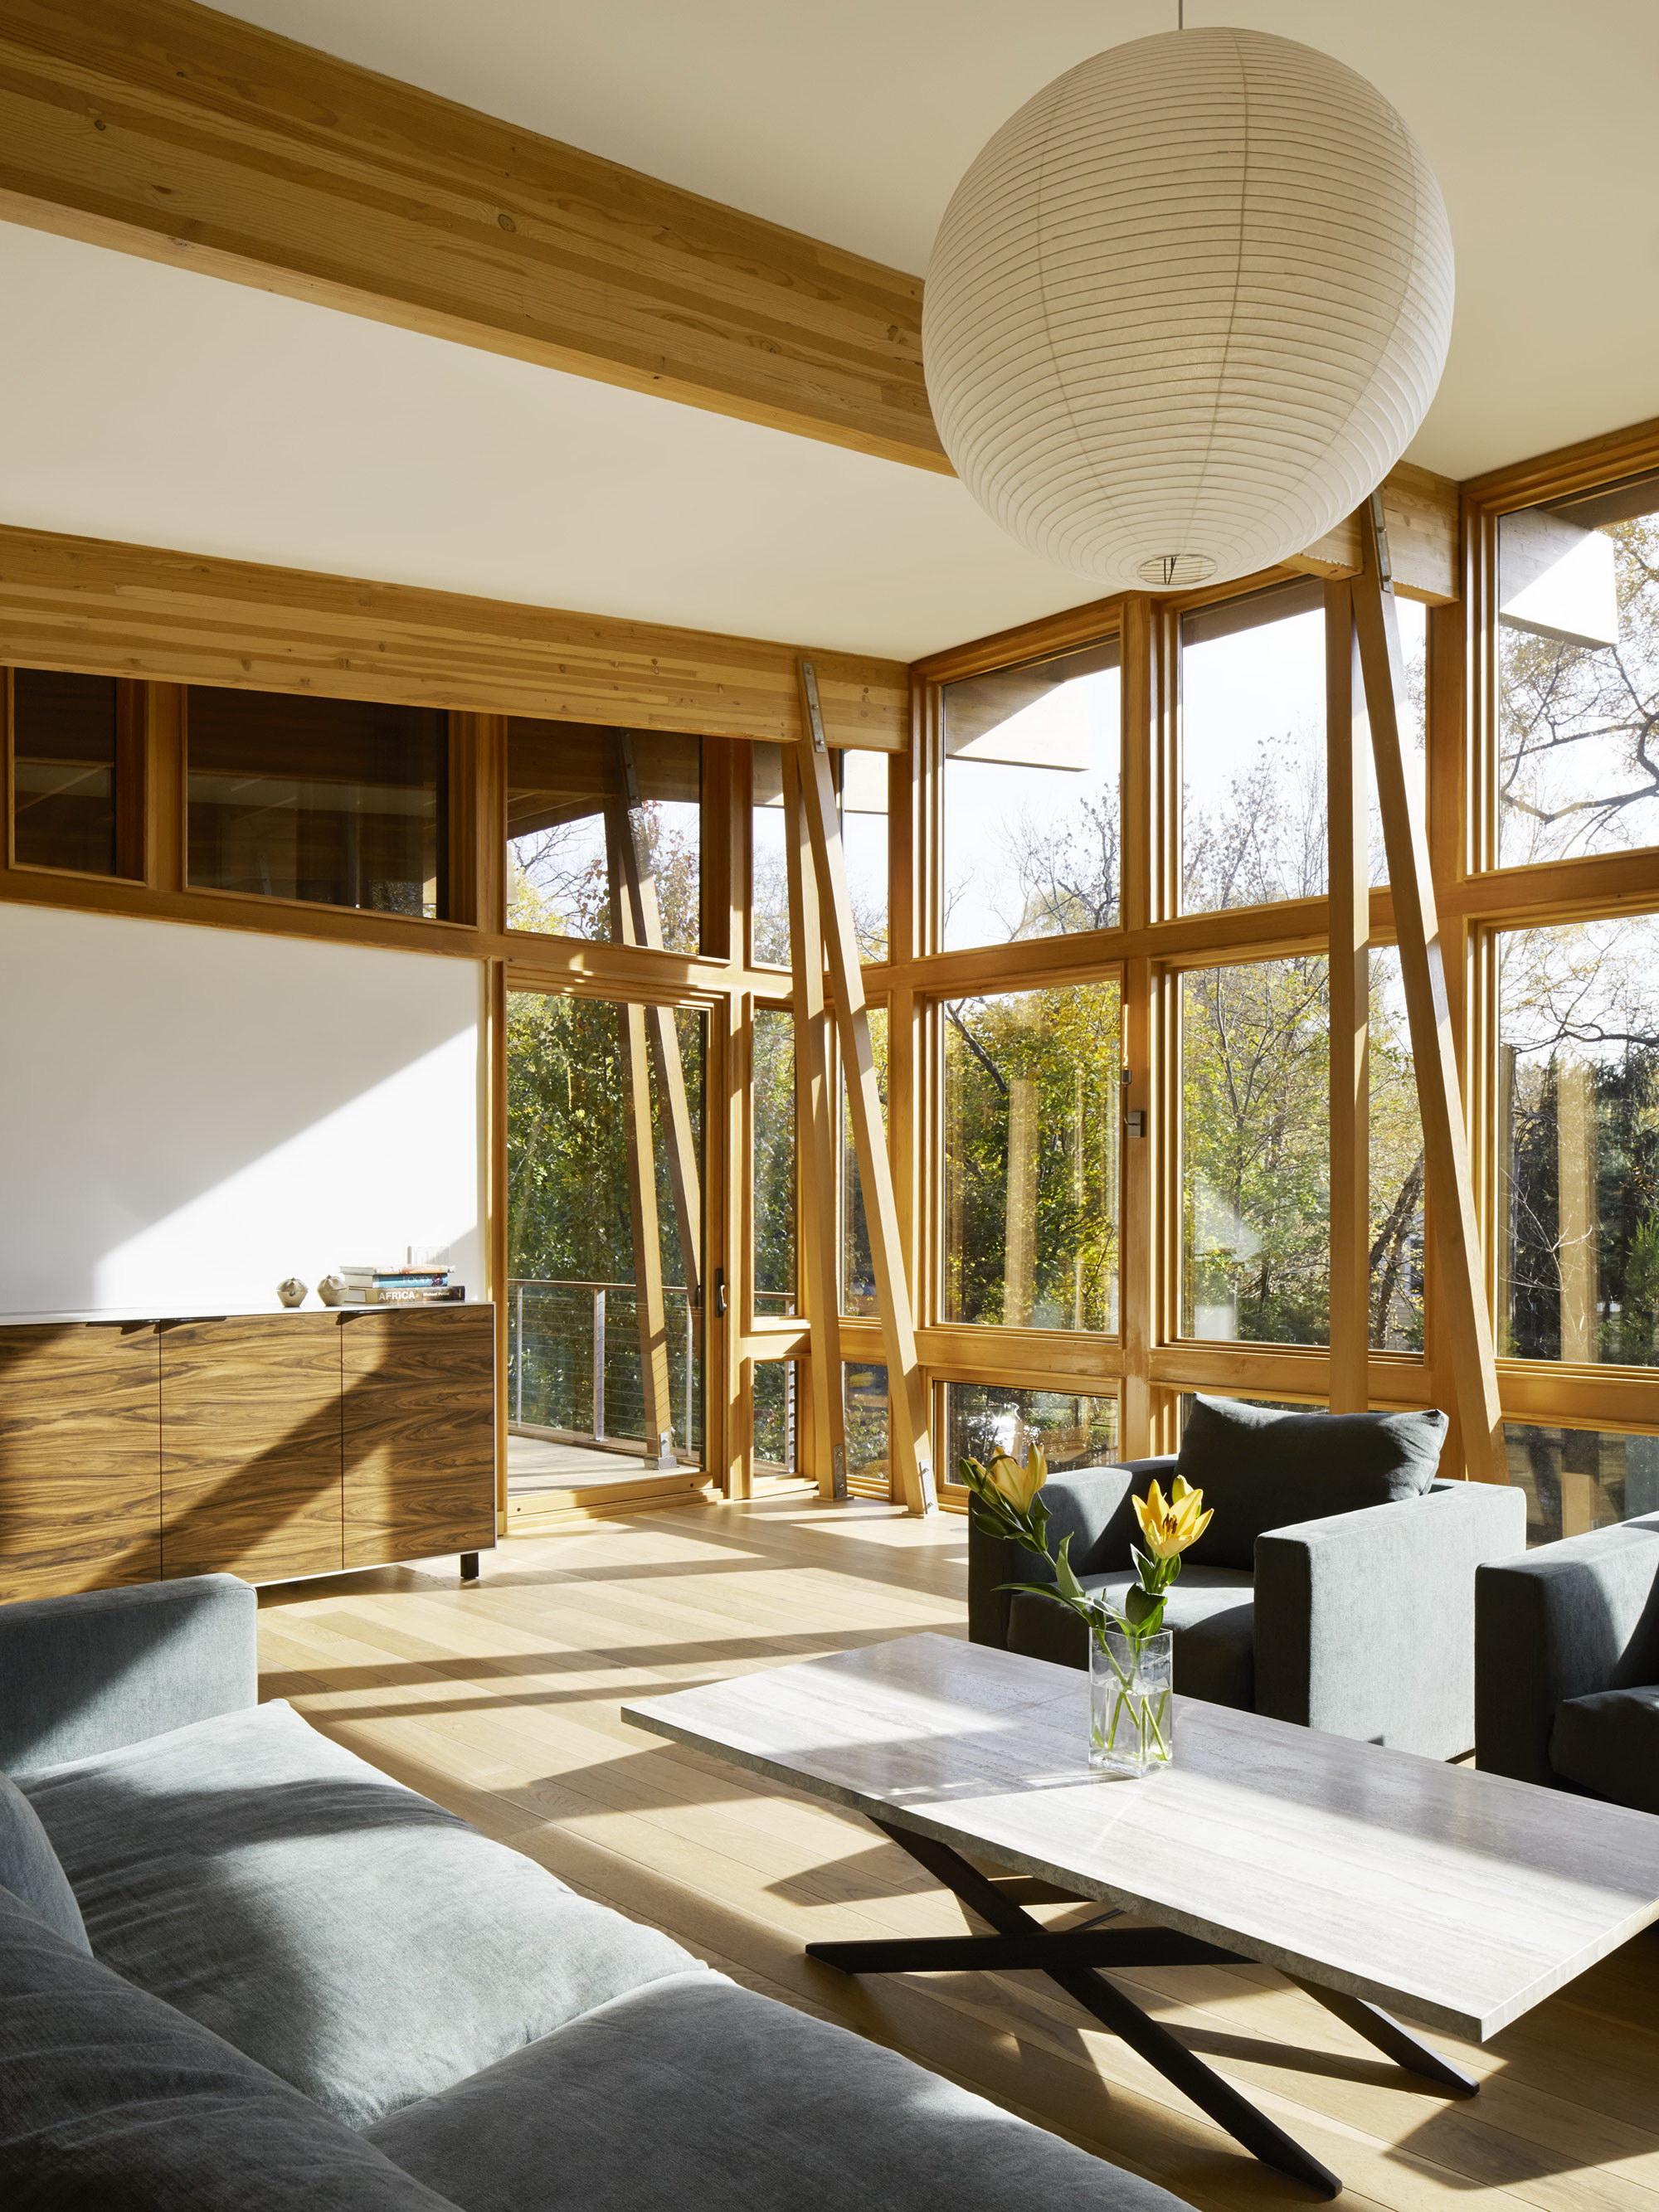 Sands Point House by Ole Sondresen Architect